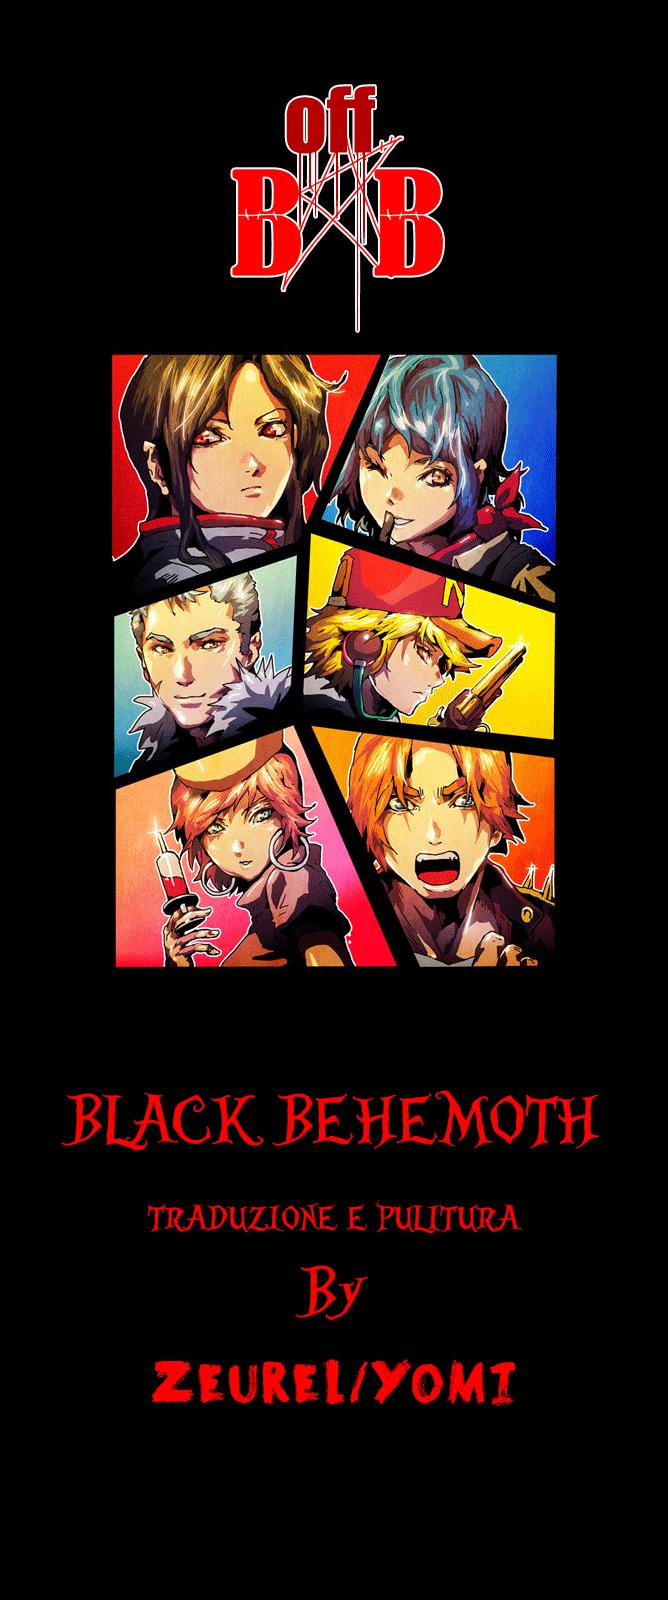 BlackBehemoth- ch 8 Zeurel